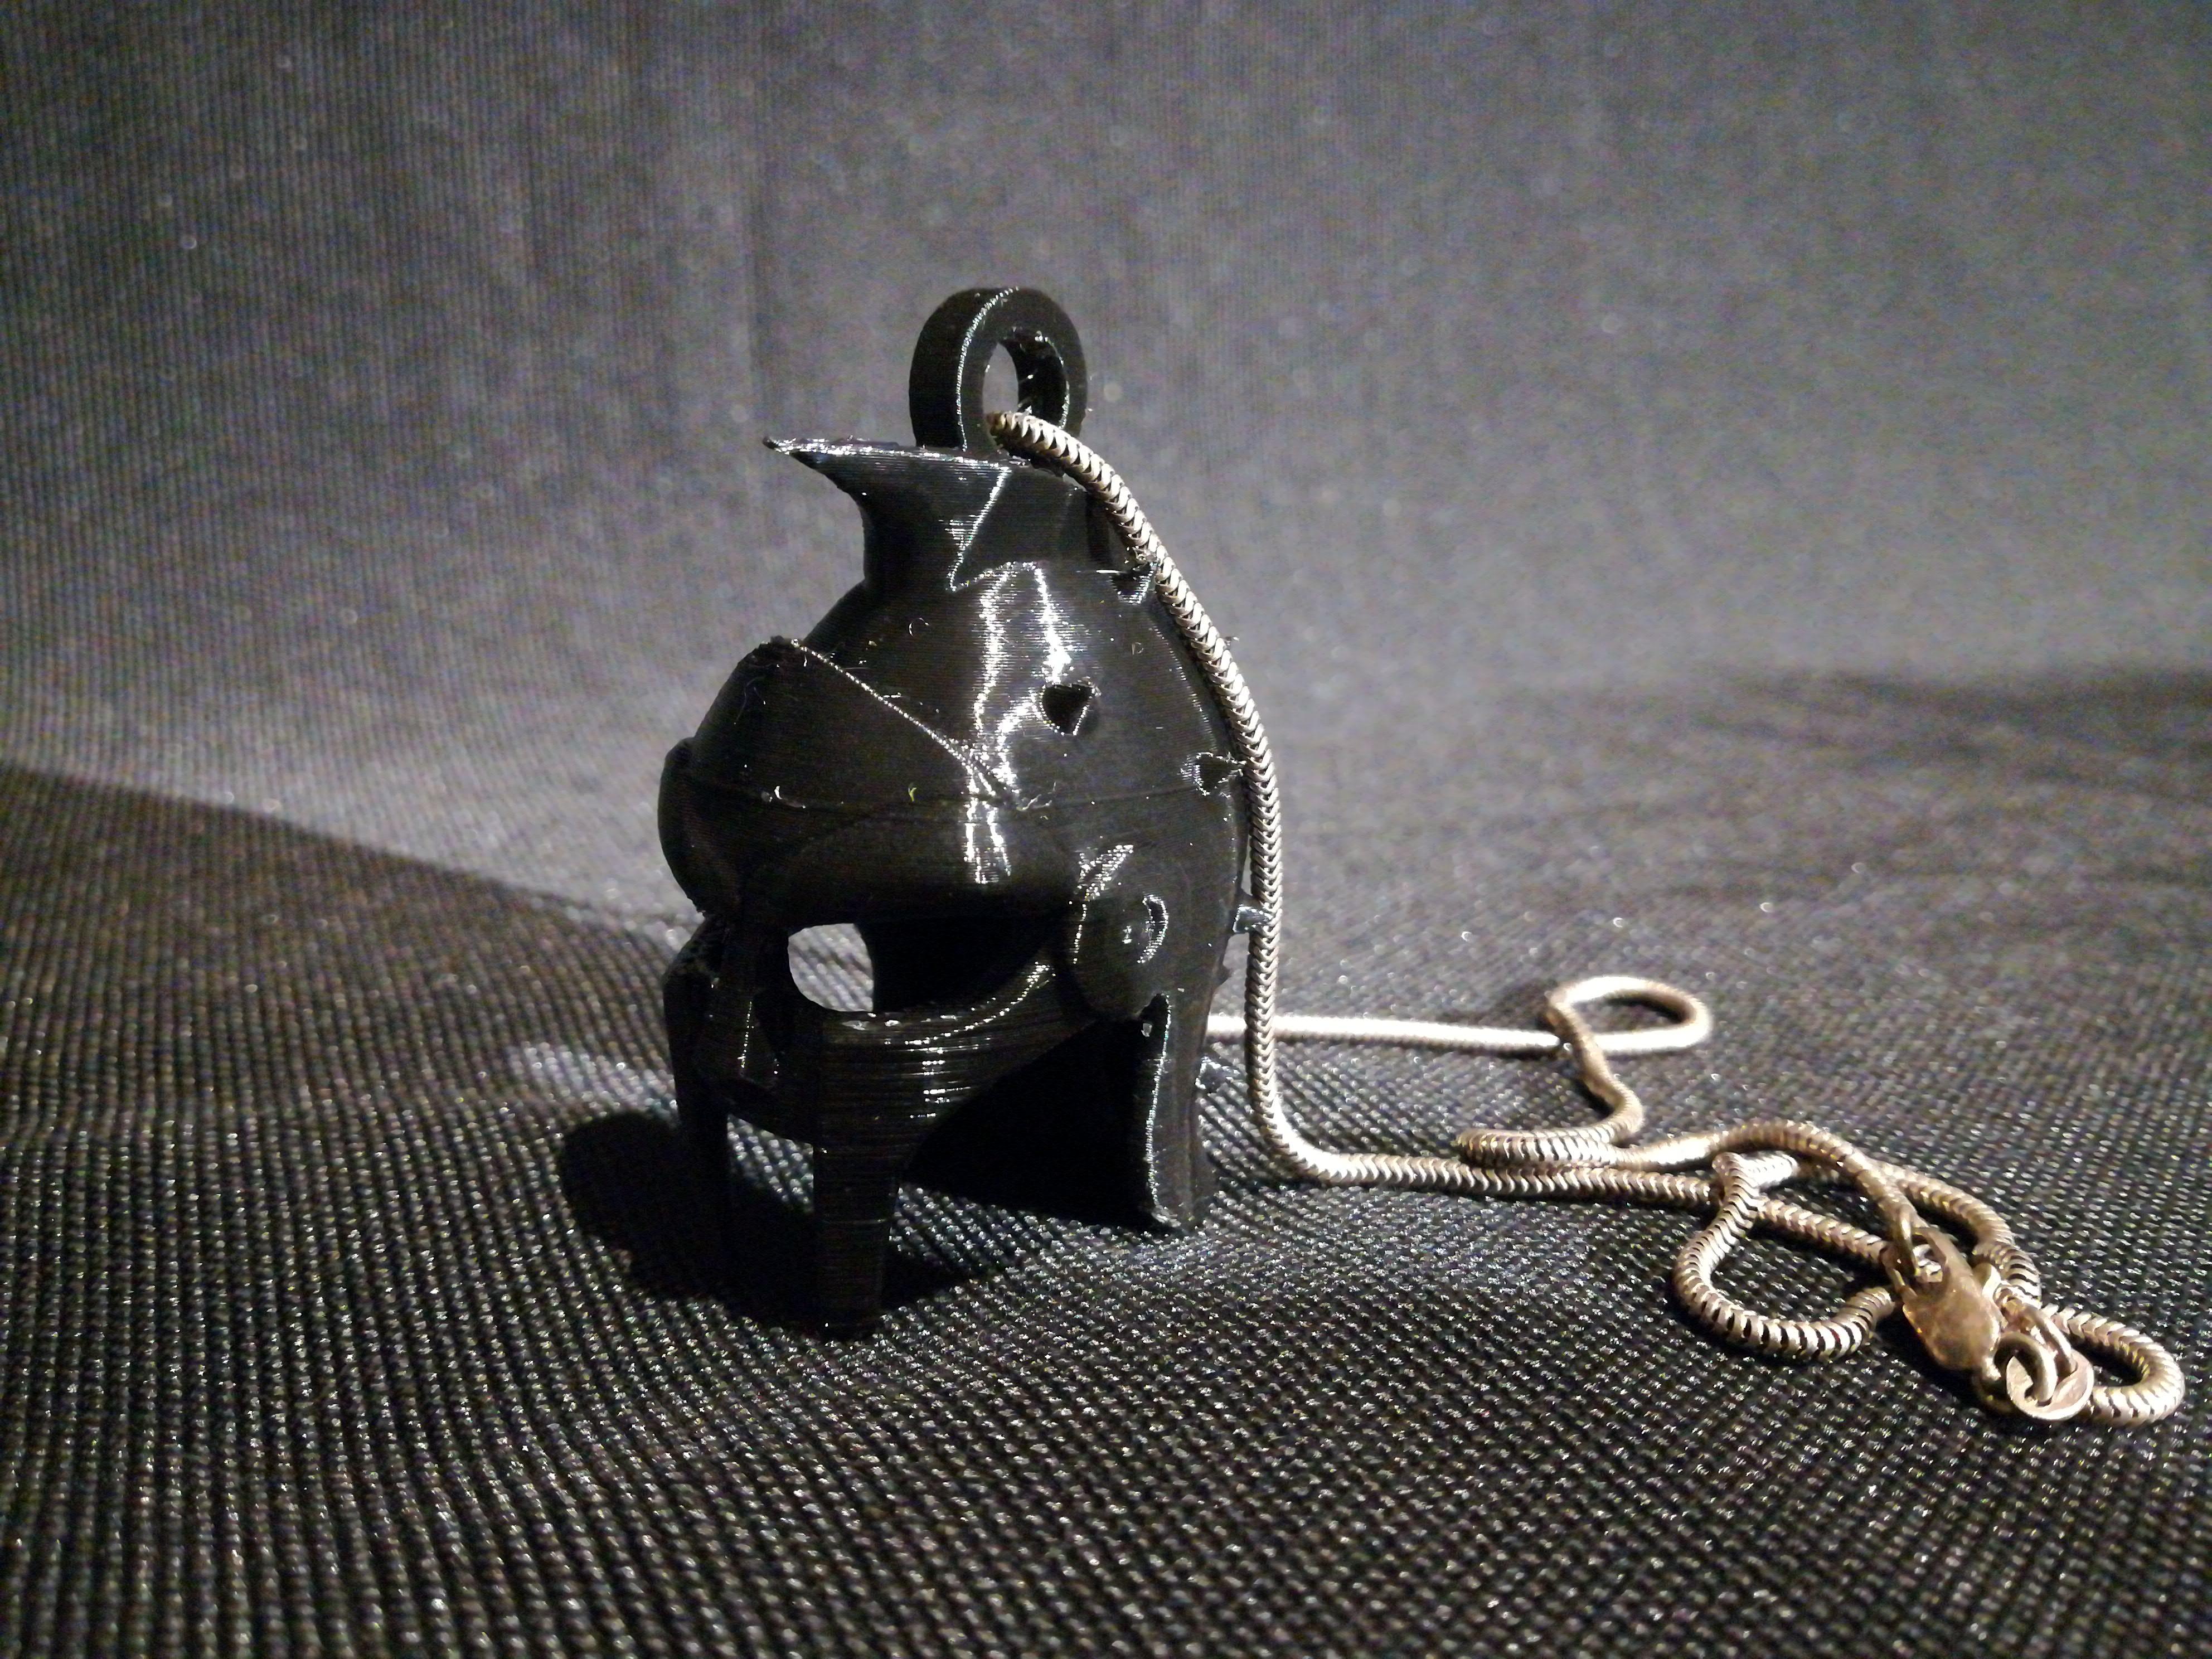 Helmet Gladiator Keychain image